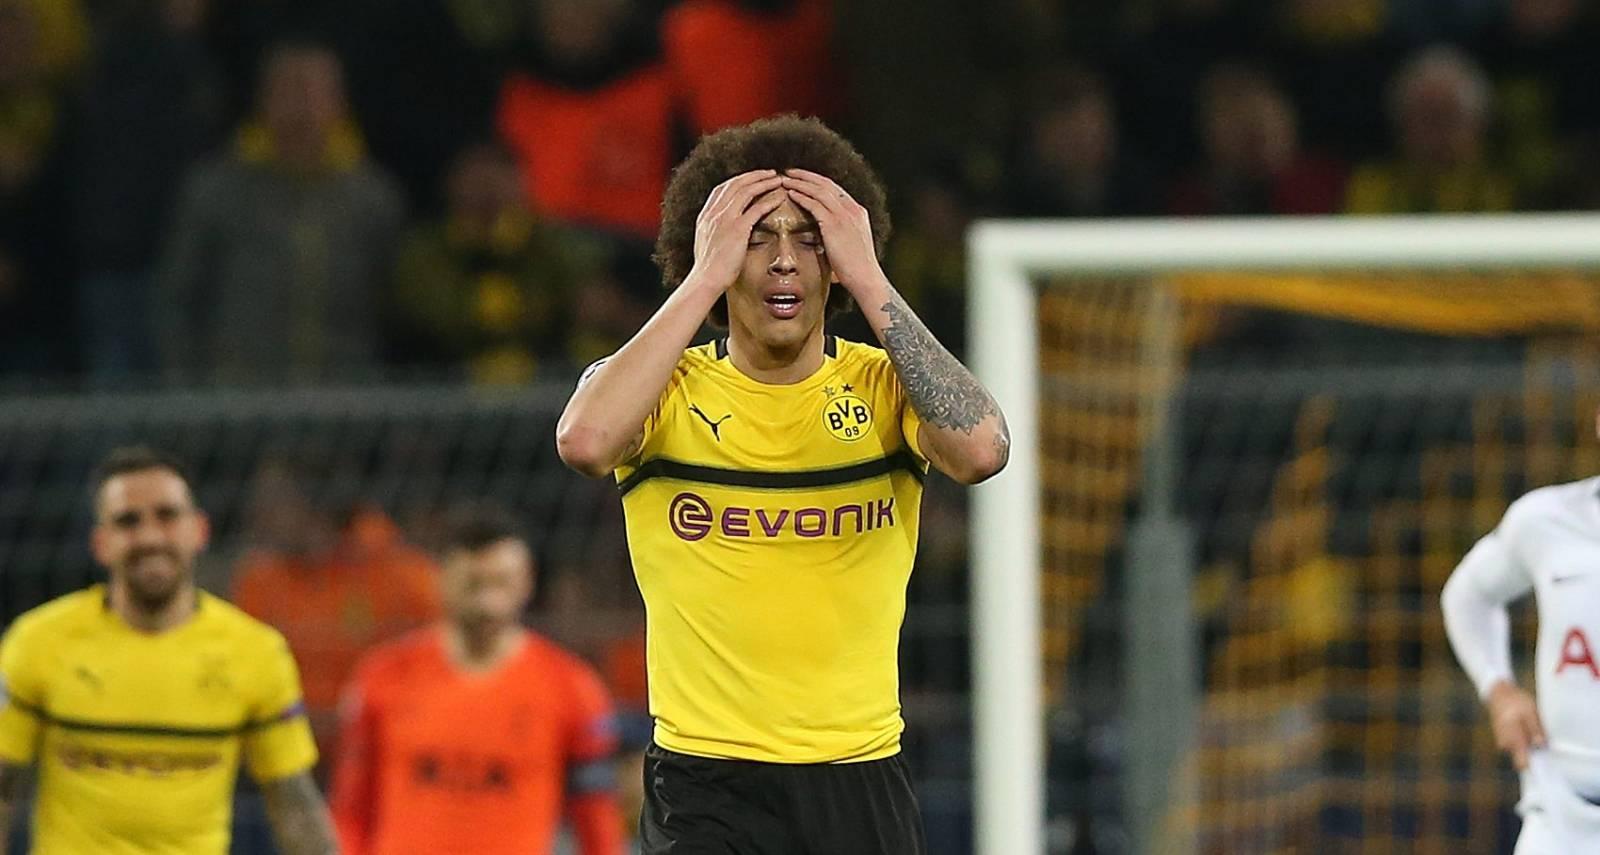 firo: 05.03.2019, Football, Football: UEFA, Champions League, CL, Season 2018/2019, Round of 16, Ruckspiel, BVB, Borussia Dortmund - Tottenham Hotspur